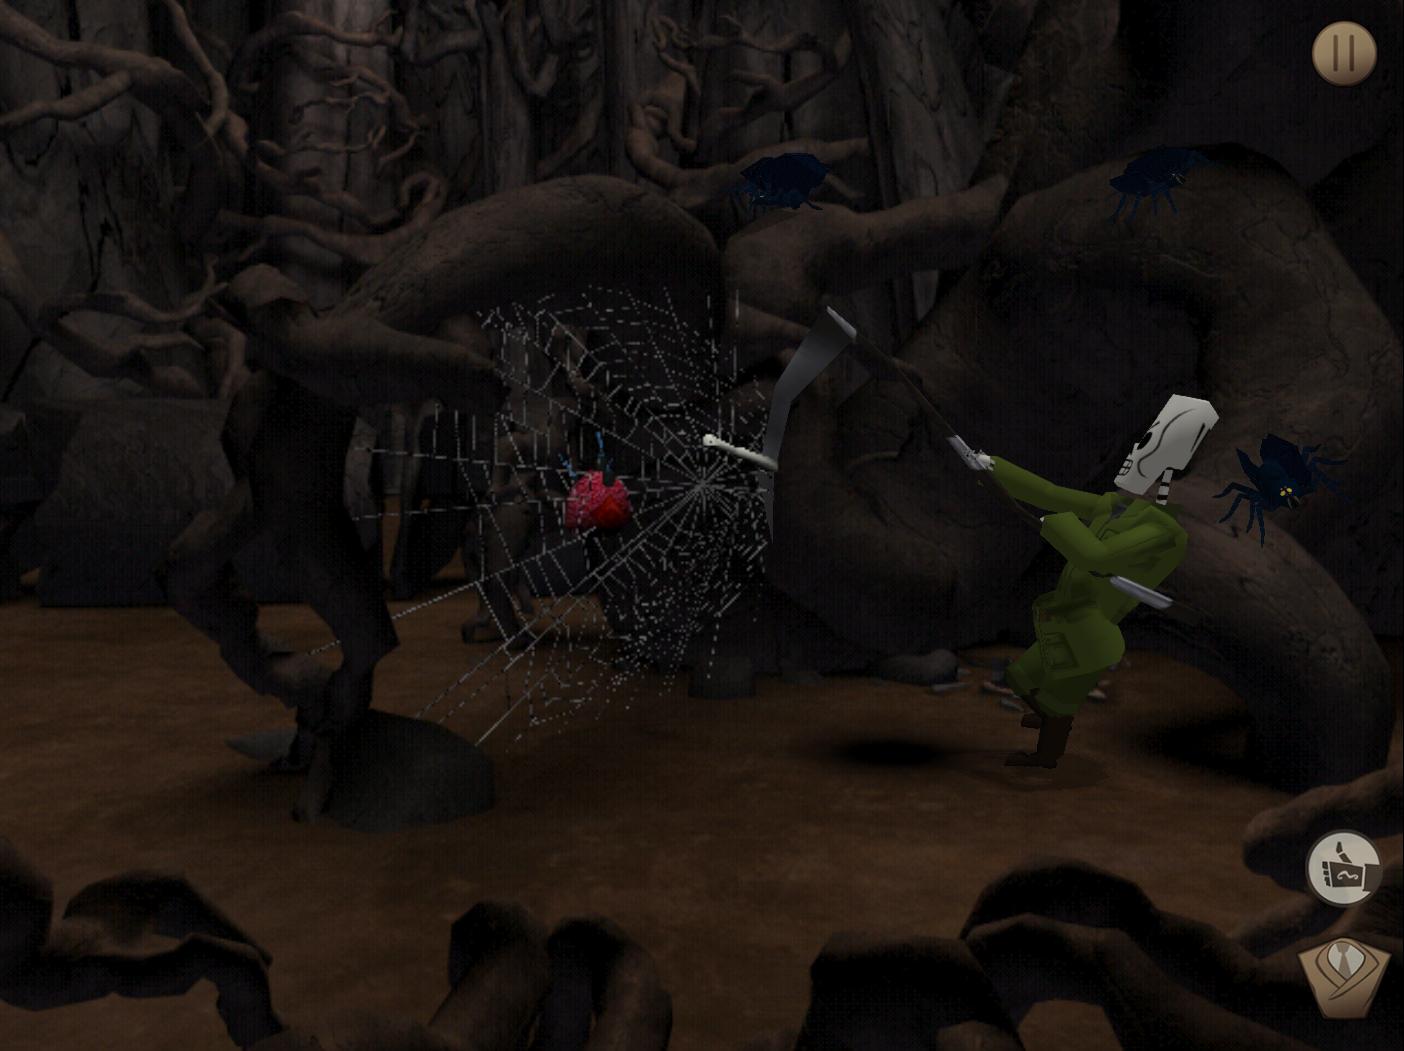 Grim Fandango Remastered 977c4cbe91492f58d7de03a69322376e0b4dd5c4